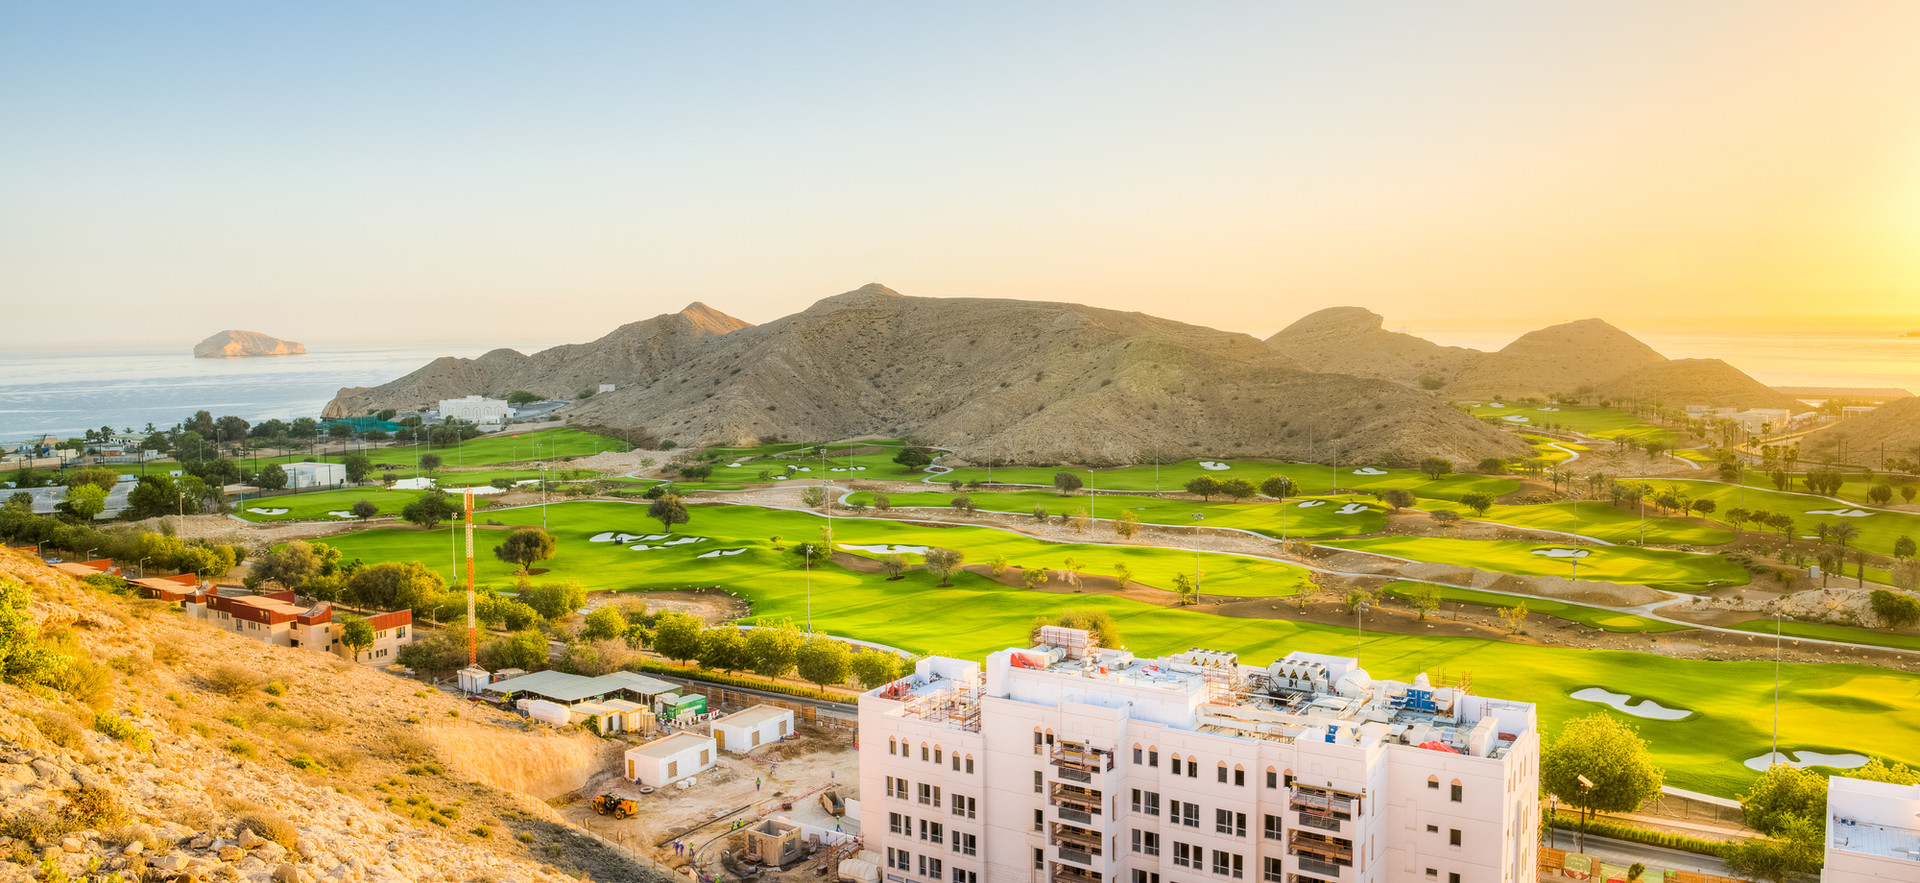 Ras Al Hamra Golf Club, Oman